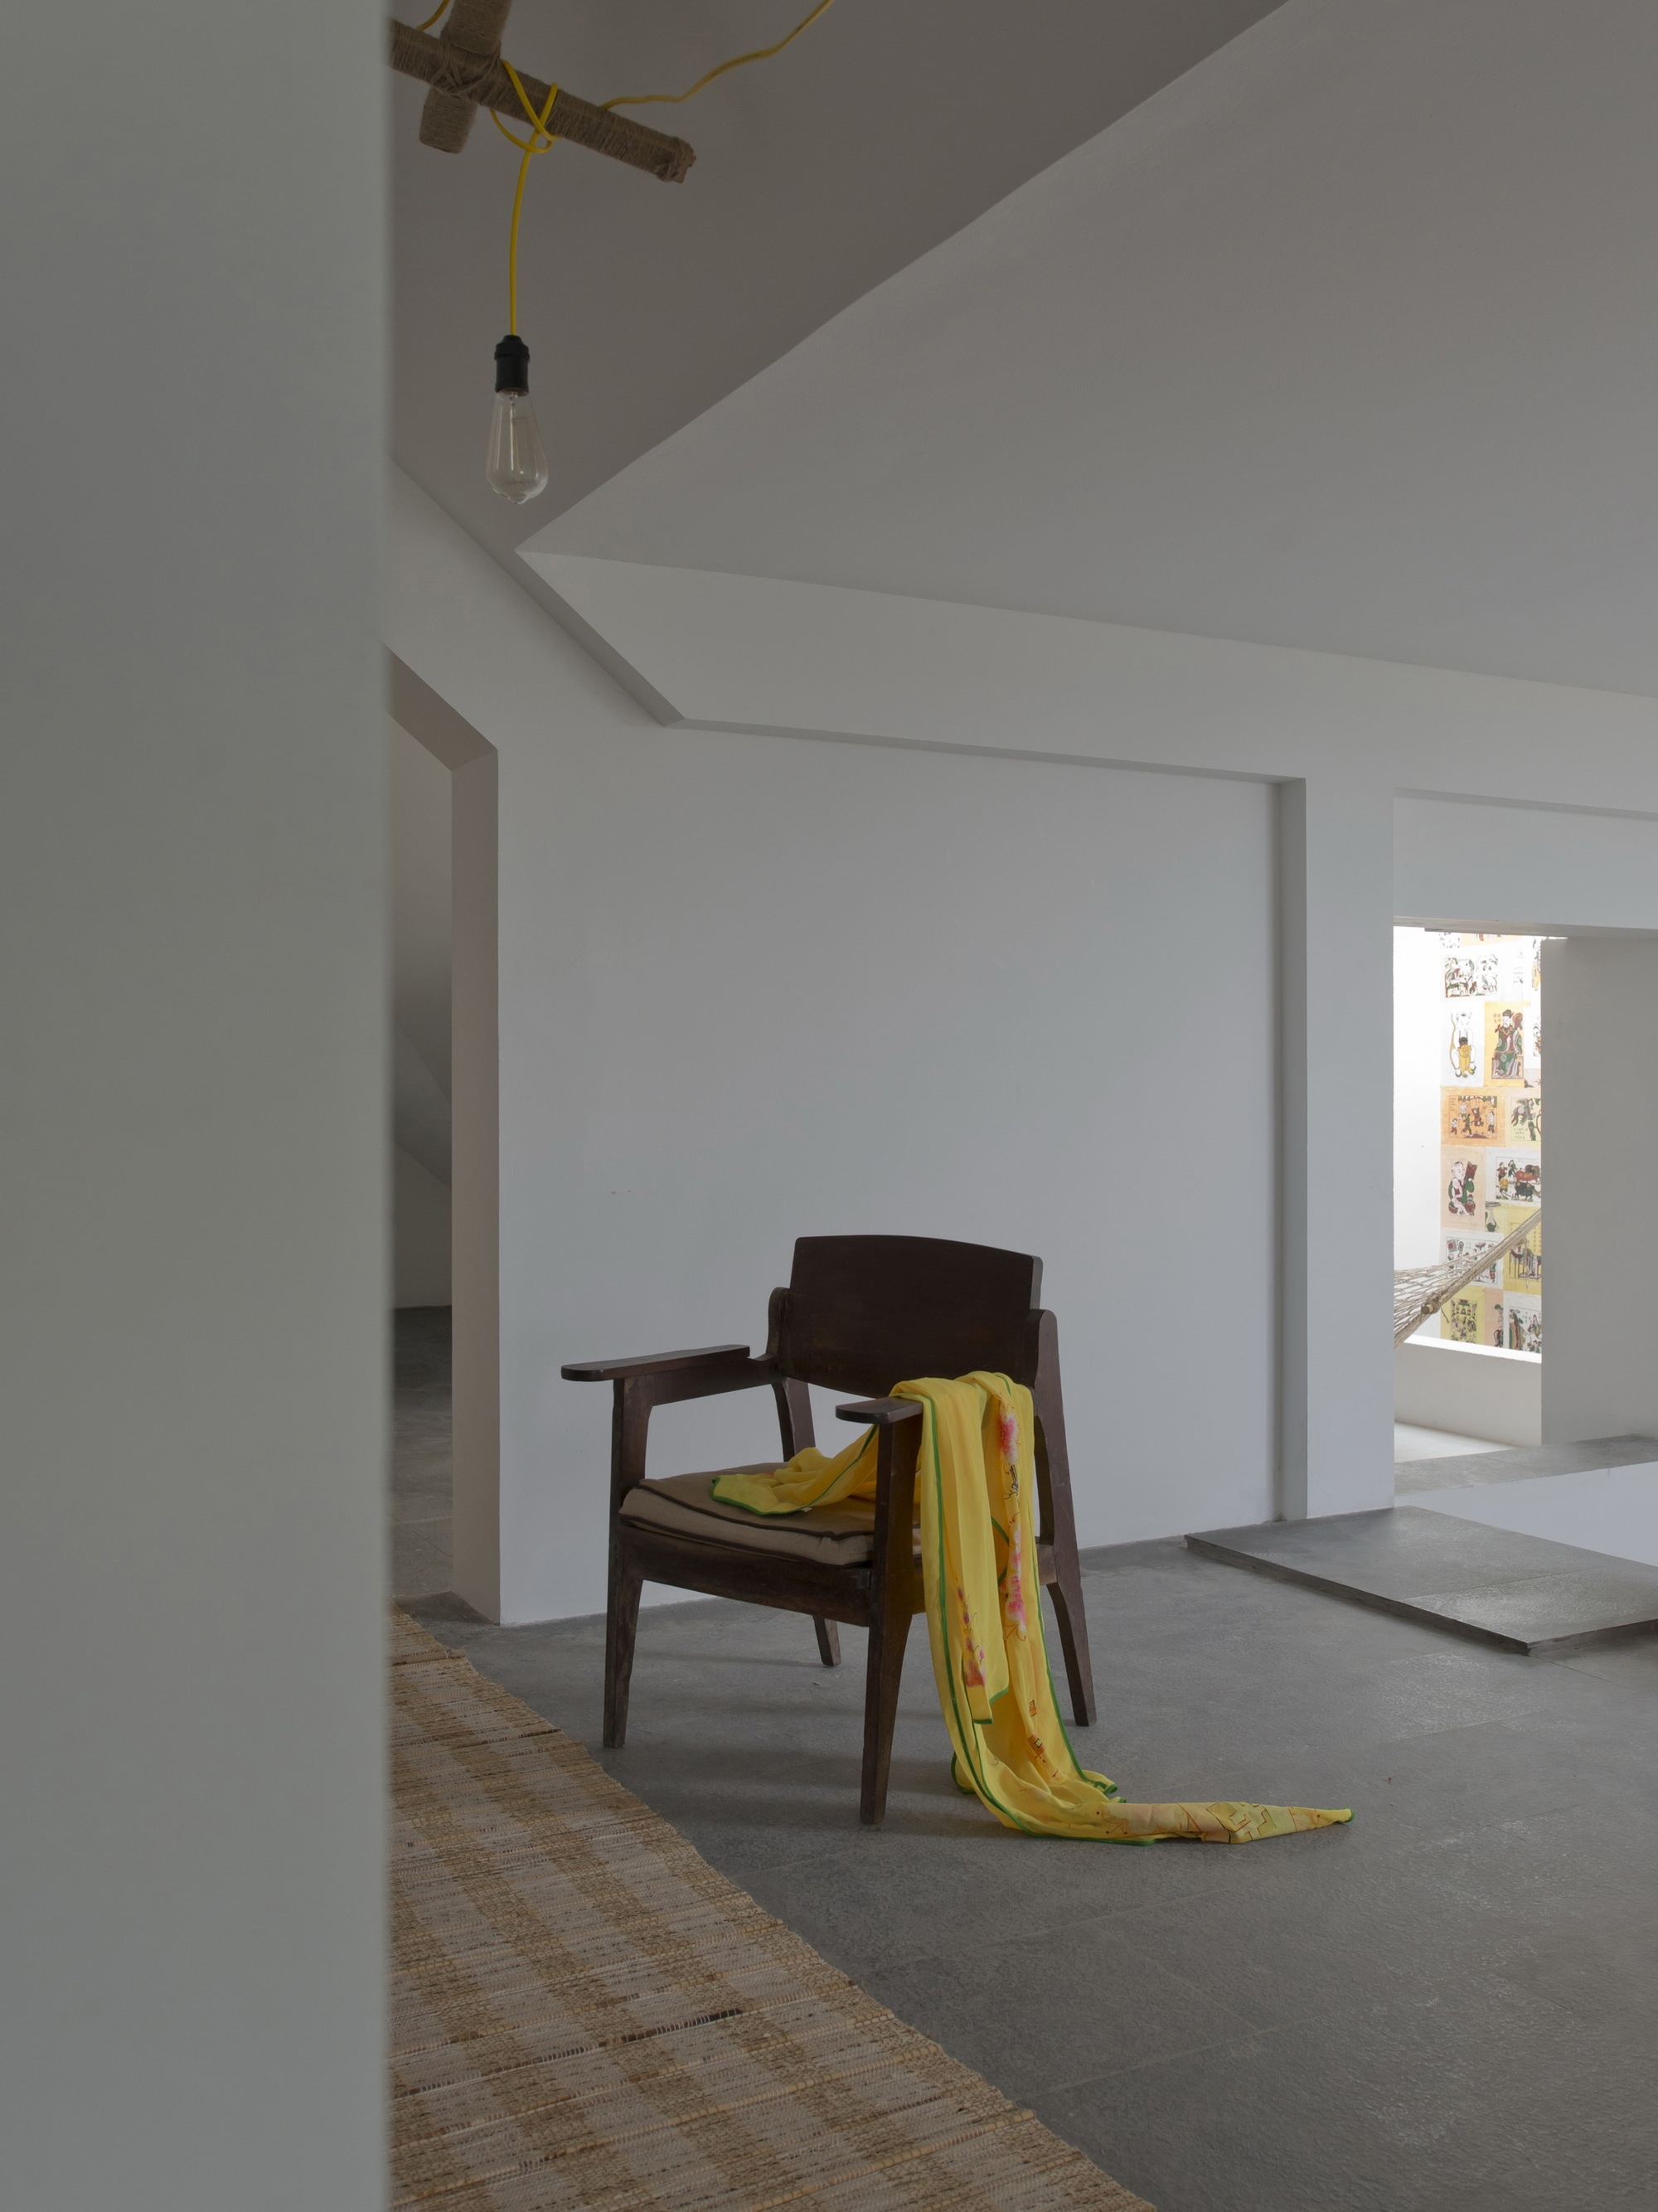 filigrane Raumgestaltung vom Origami inspiriert - fresHouse